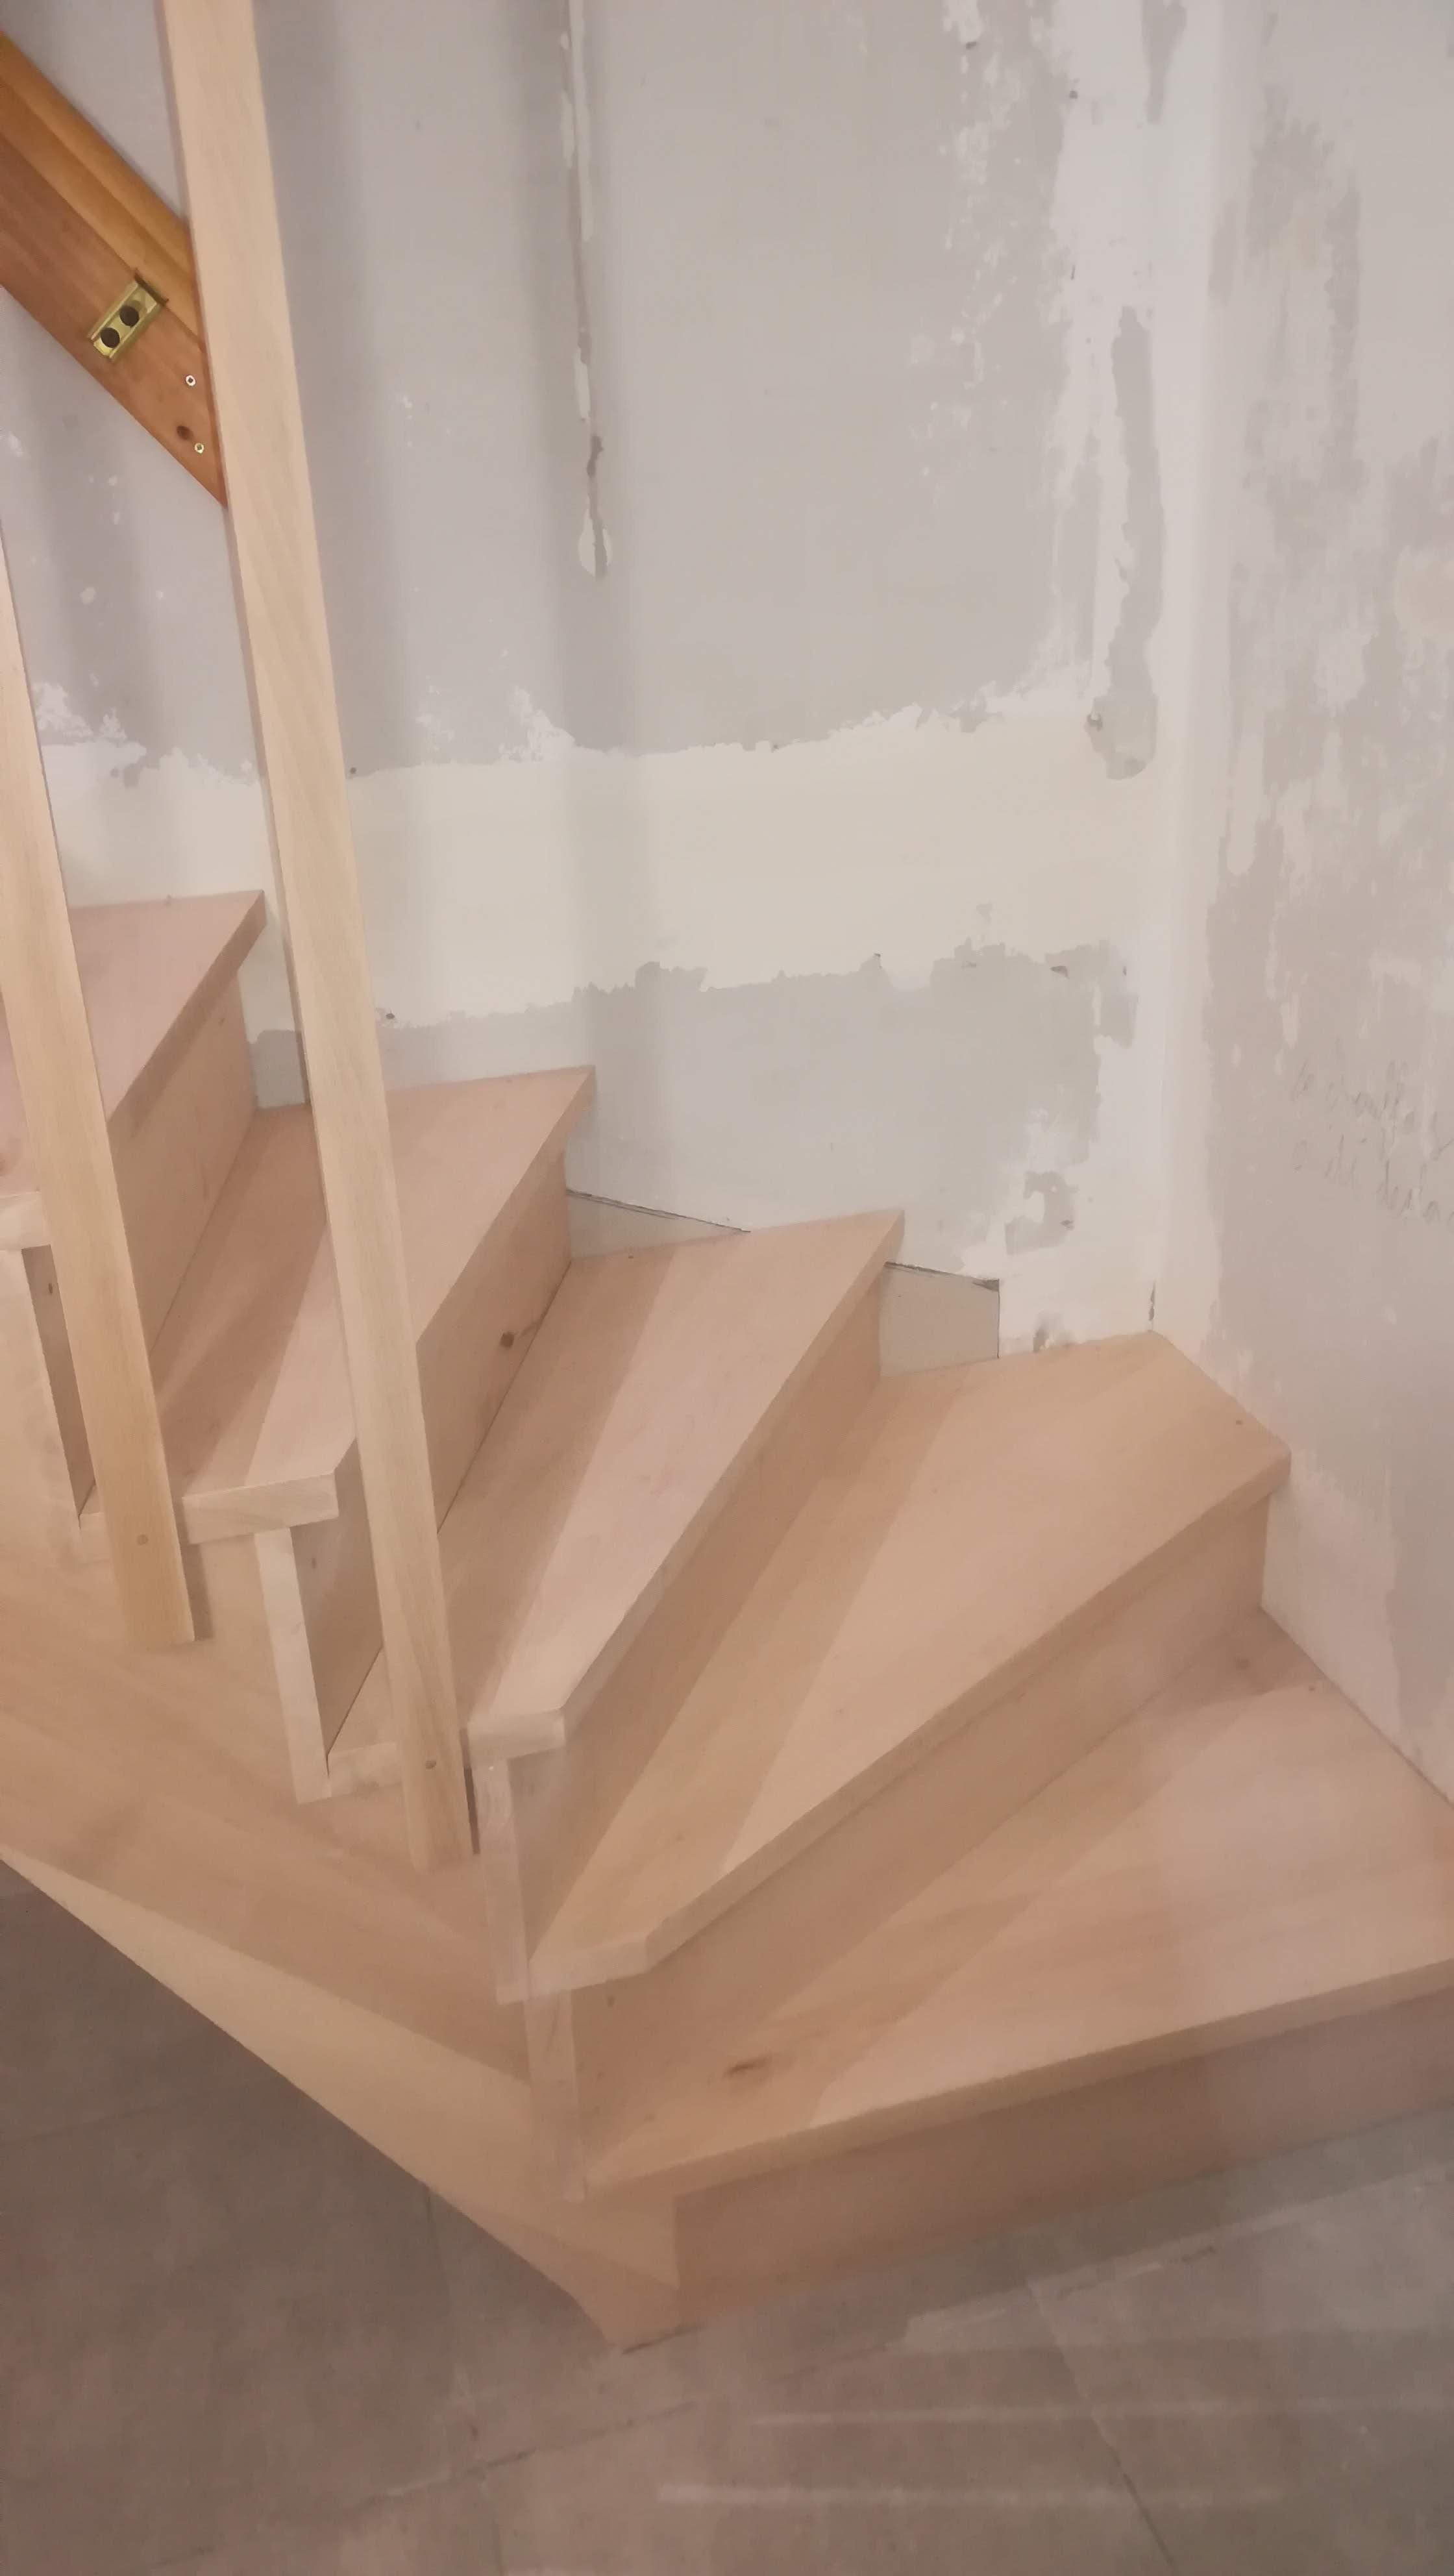 Escalier hêtre 1/4 tournant Salies De Béarn - Absolu Bois Menuiserie